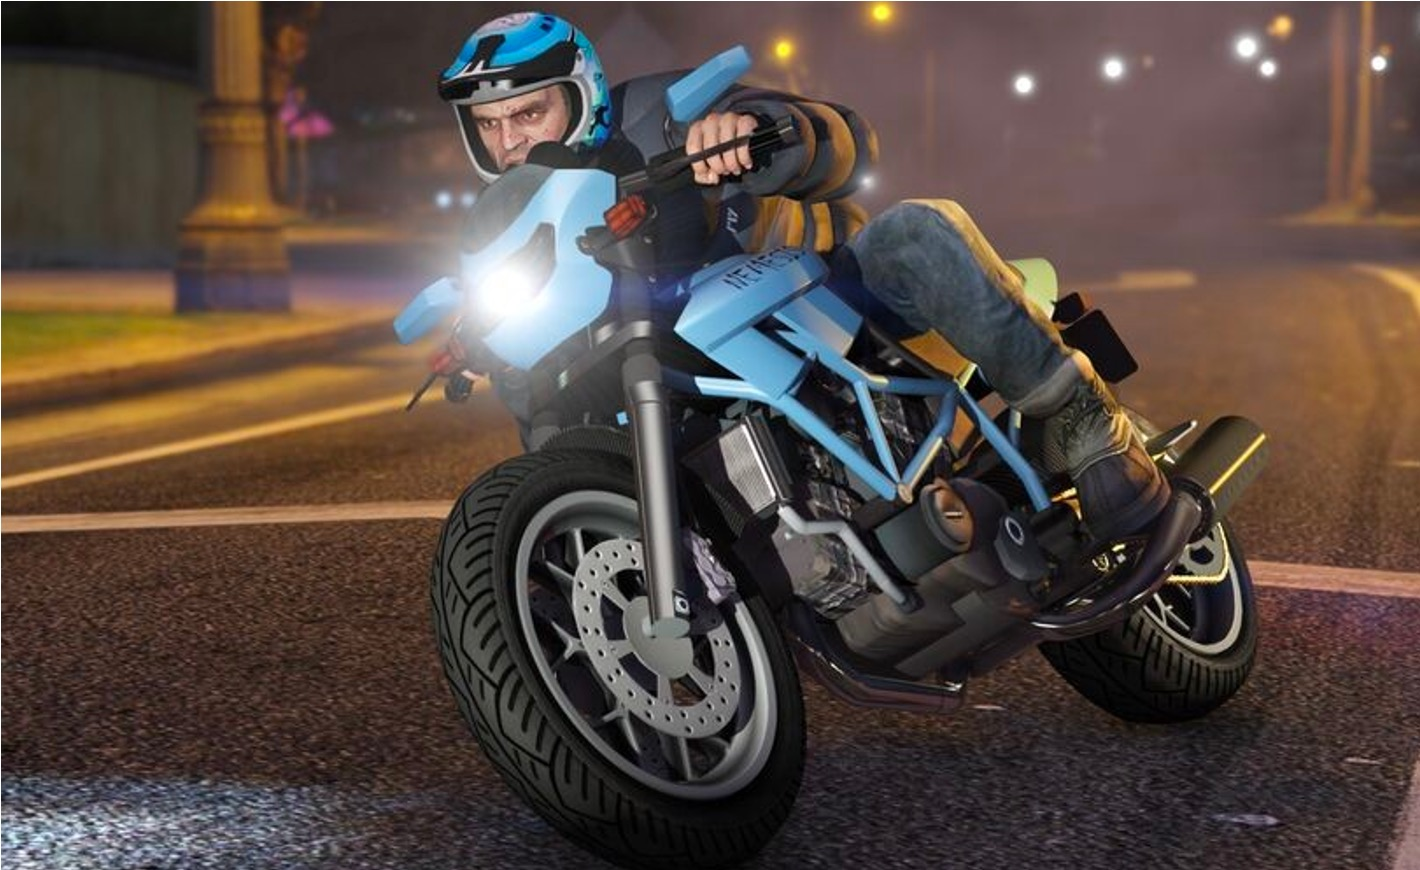 Trevor in GTA driving a Nemesis bike